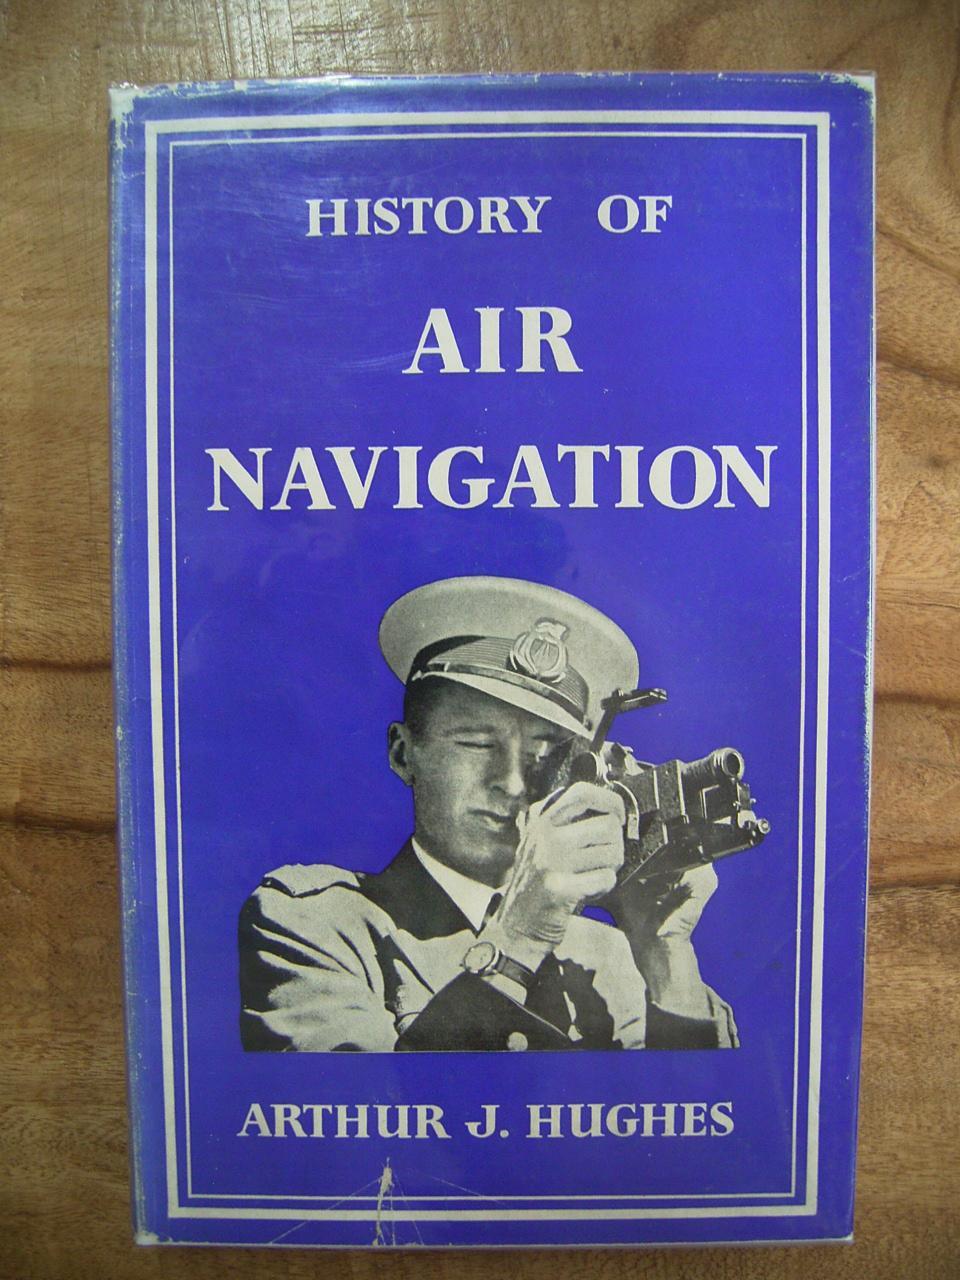 E-books in Aviation category